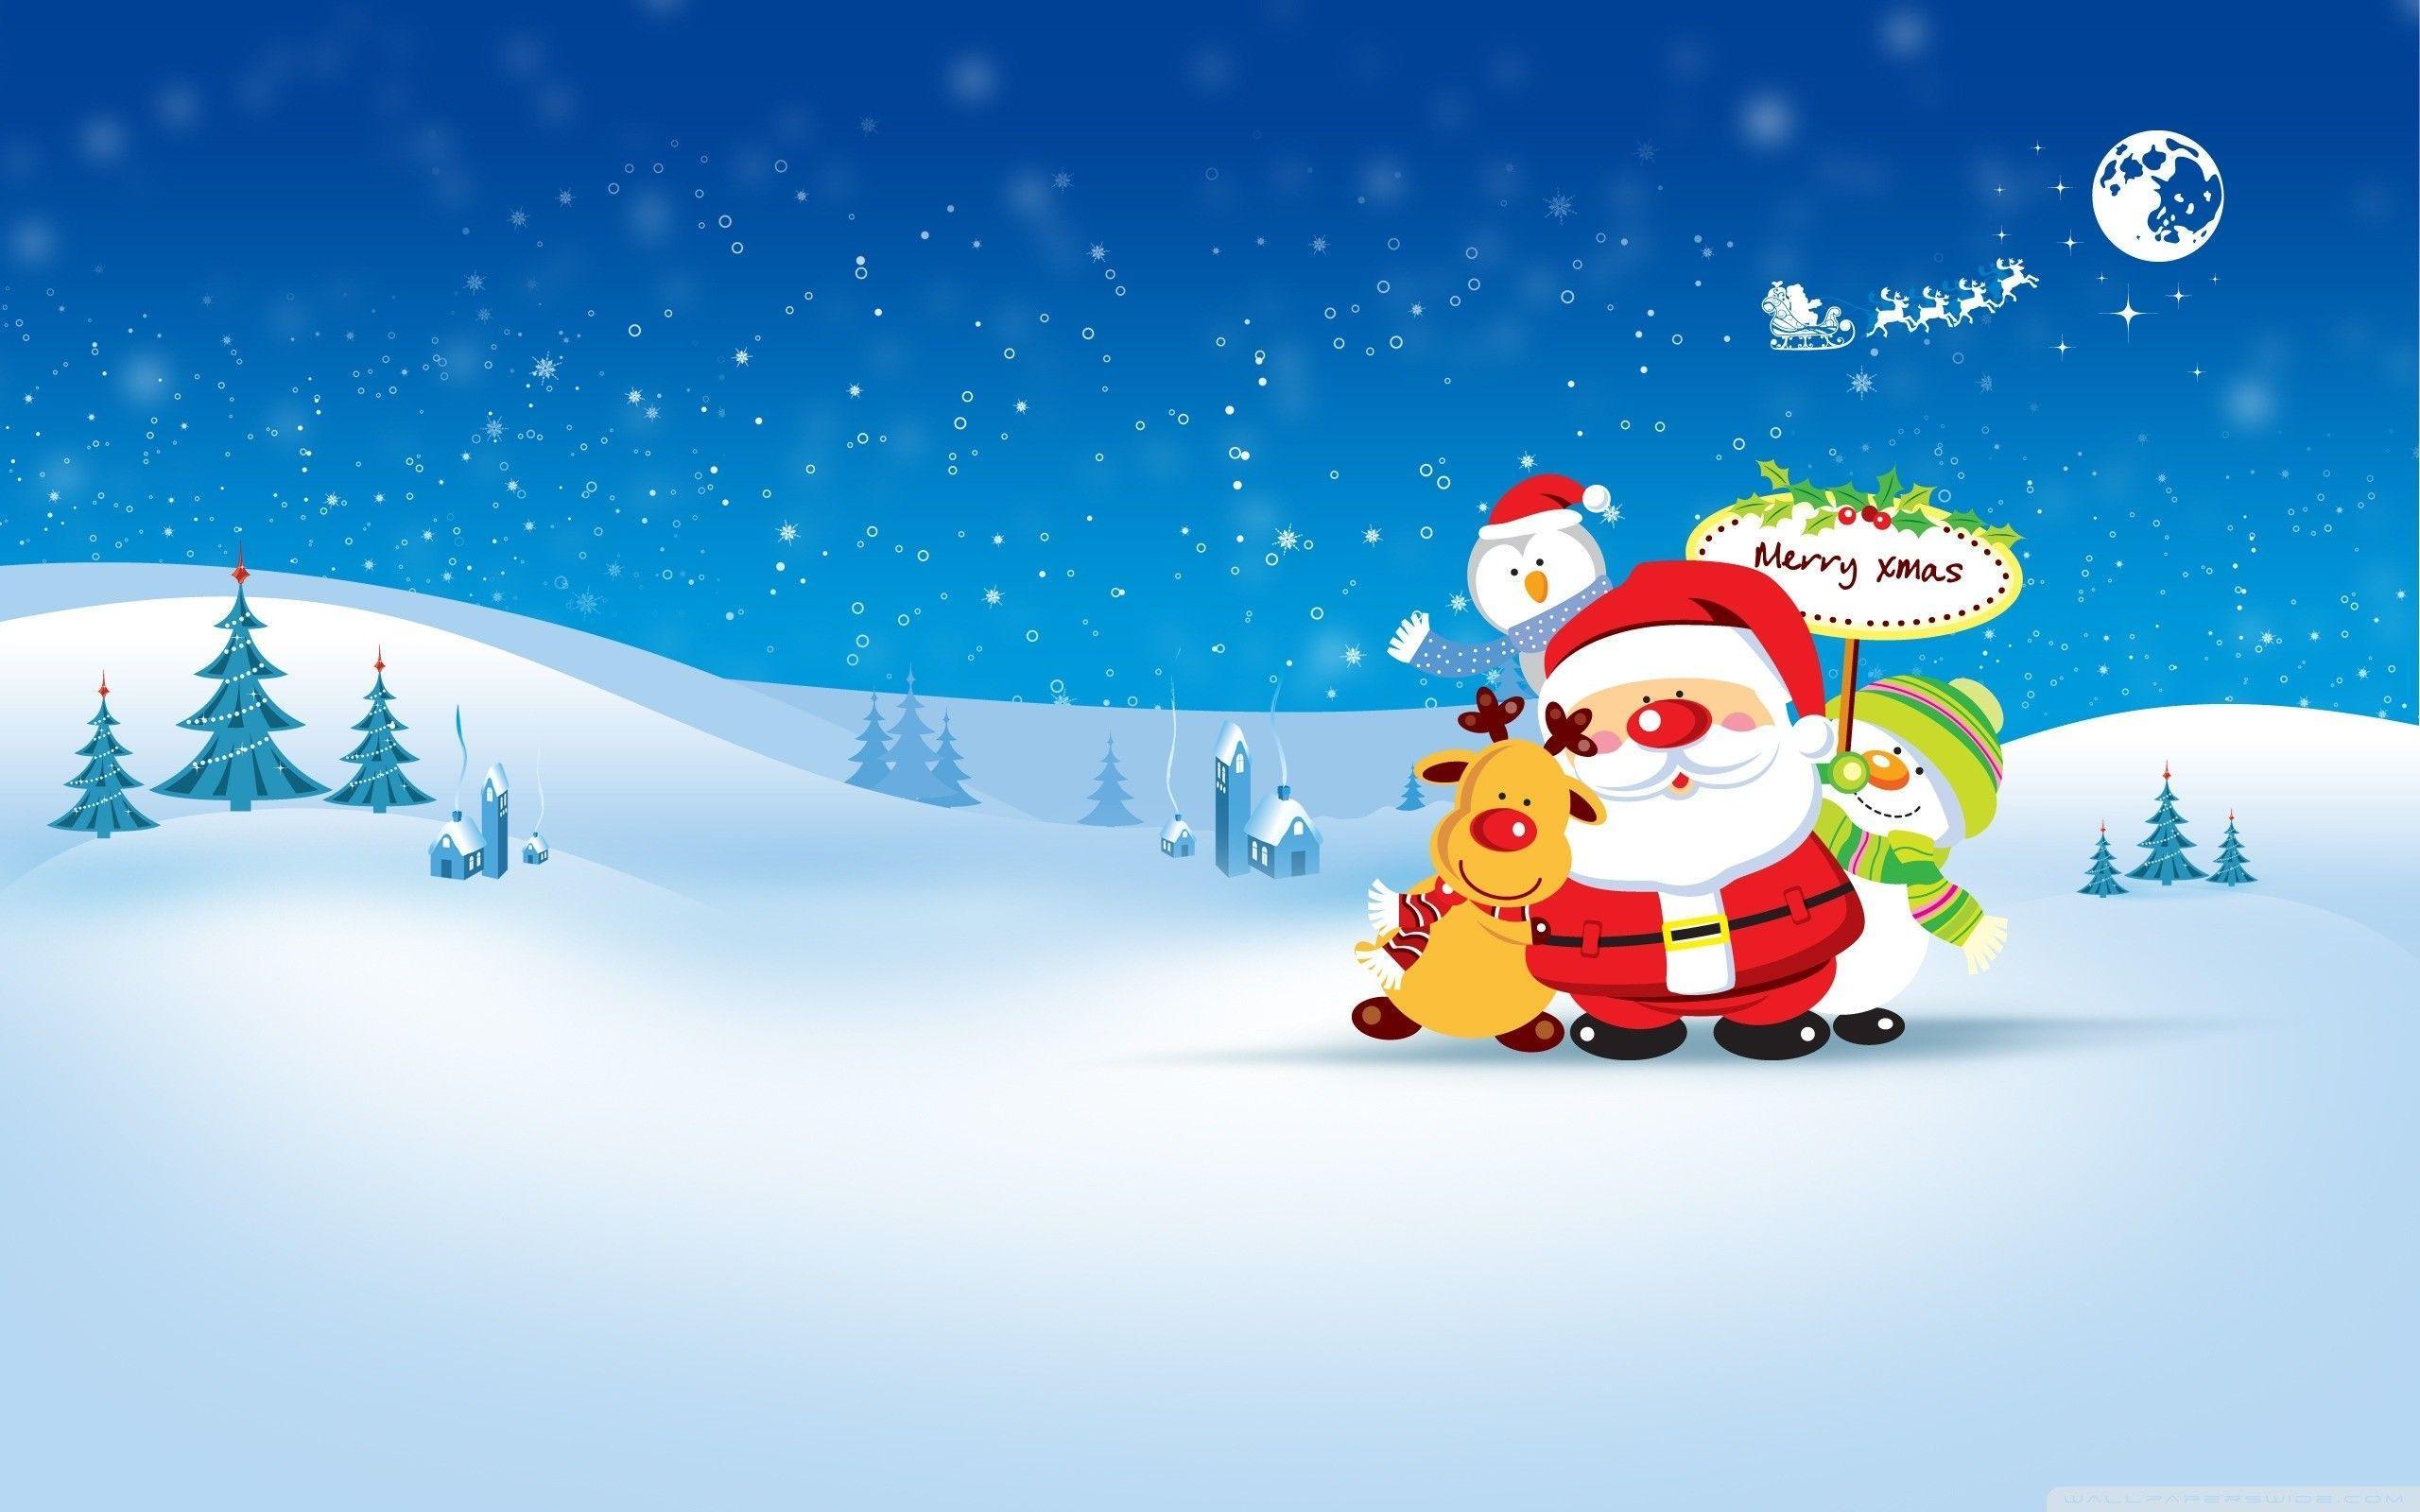 Christmas Cartoon Wallpapers - Top Free